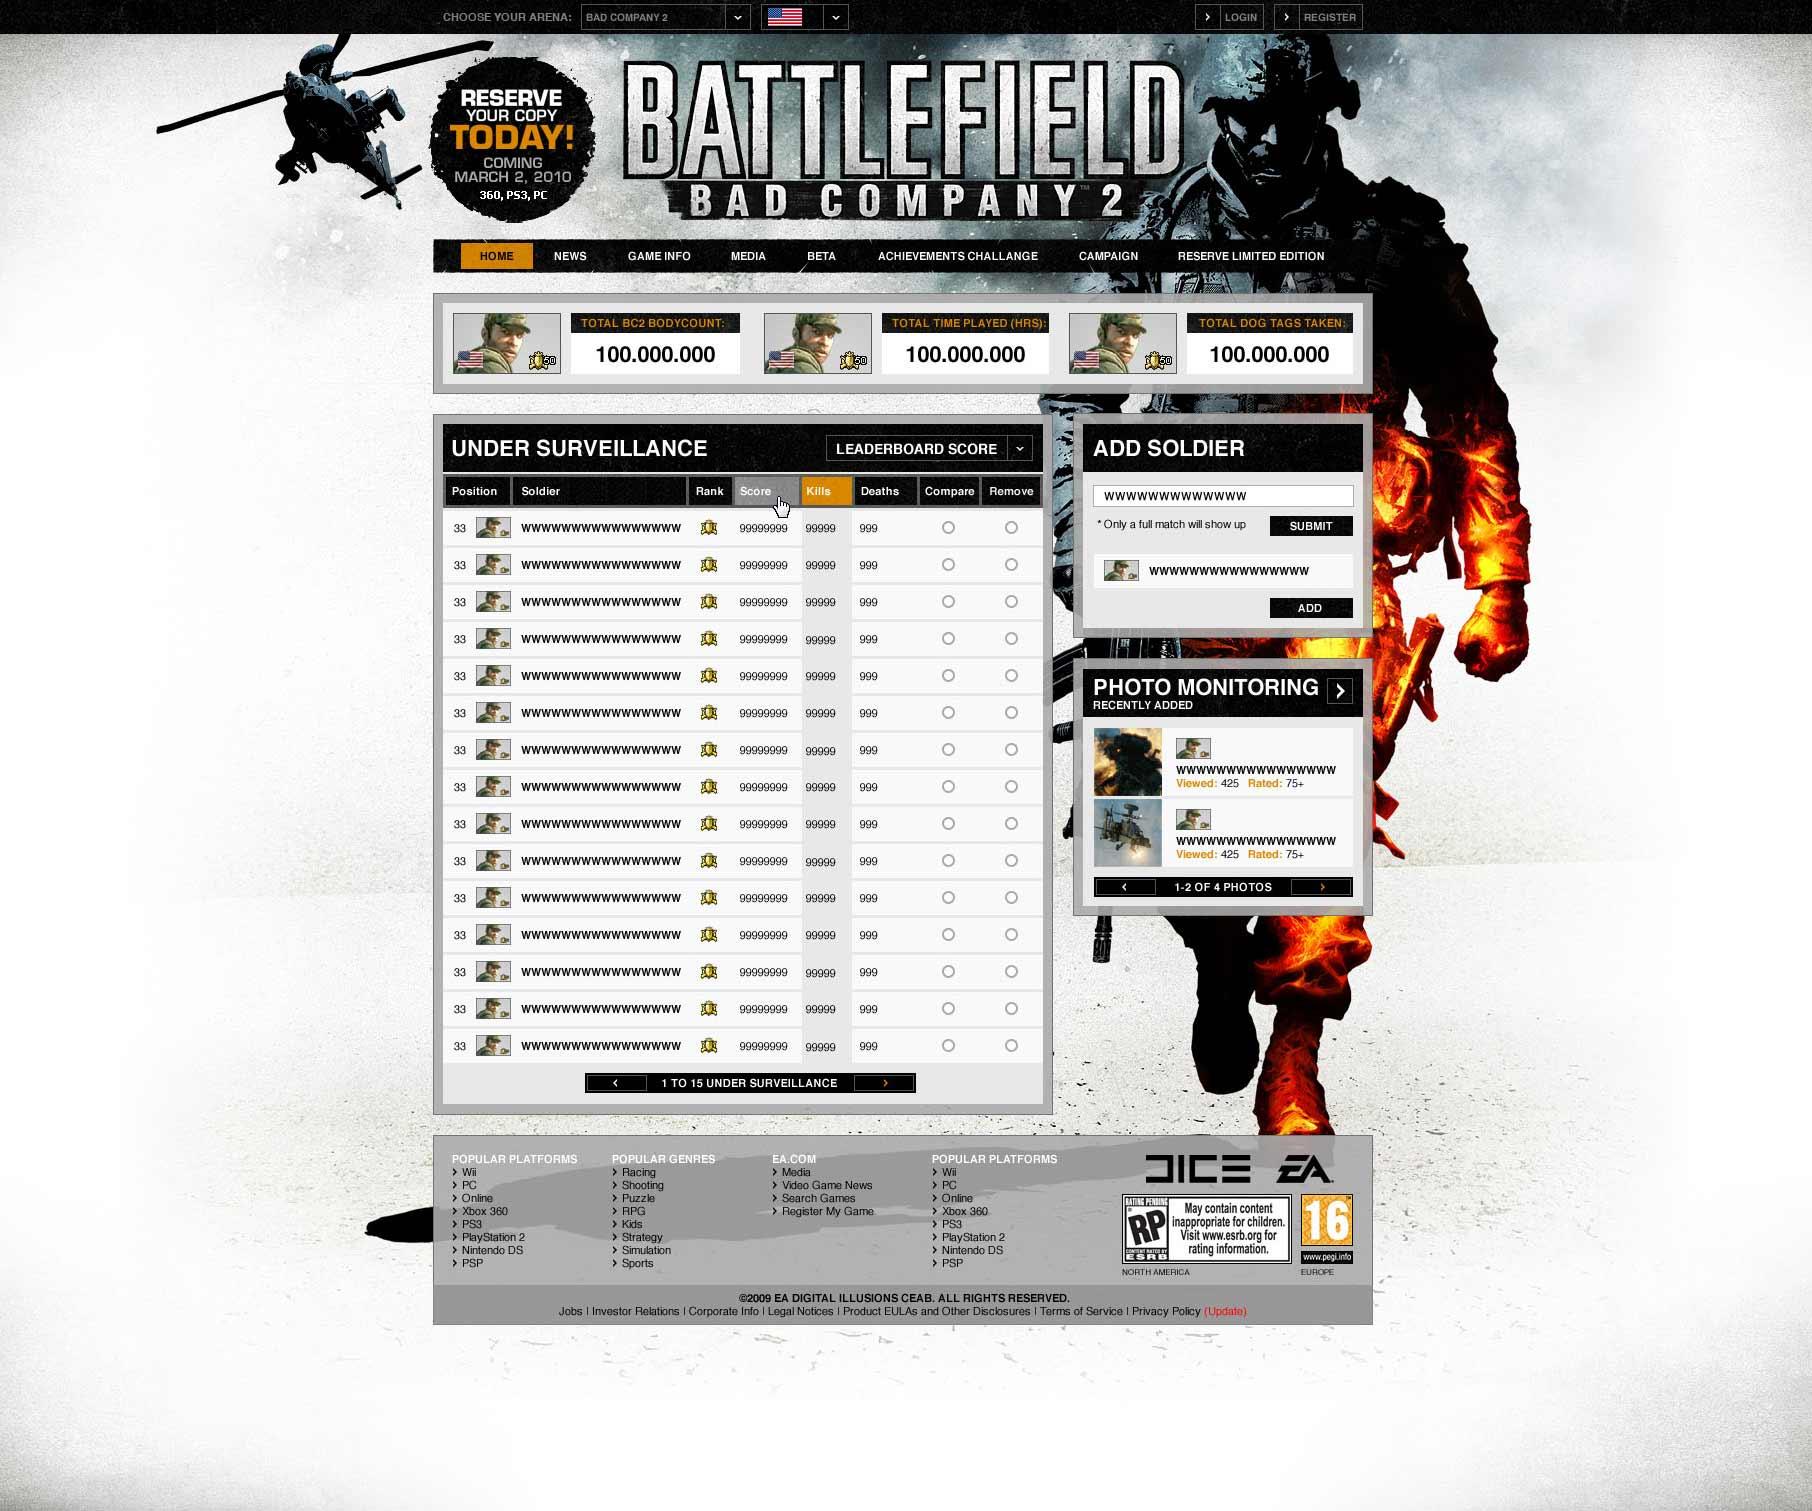 Battlefield Bad Company 2 assets 2